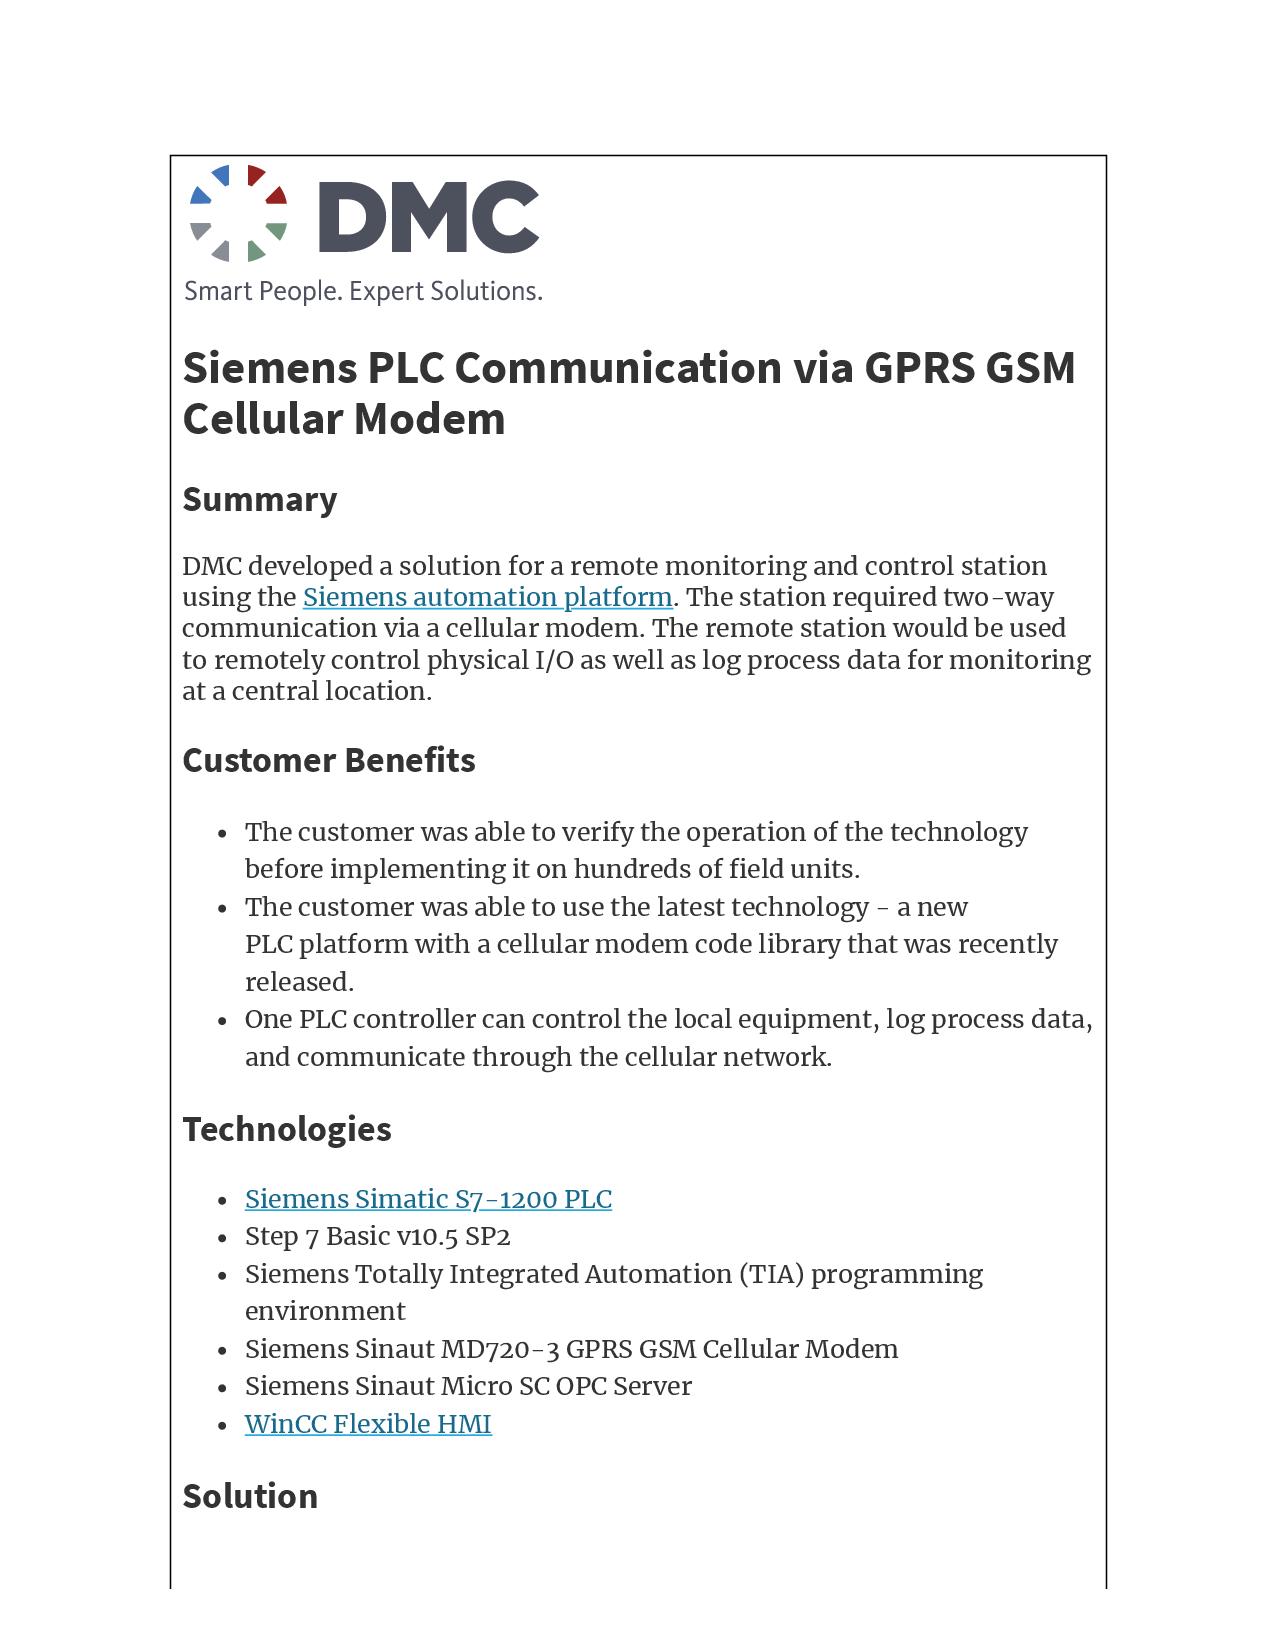 Siemens PLC Communication via GPRS GSM Cellular Modem